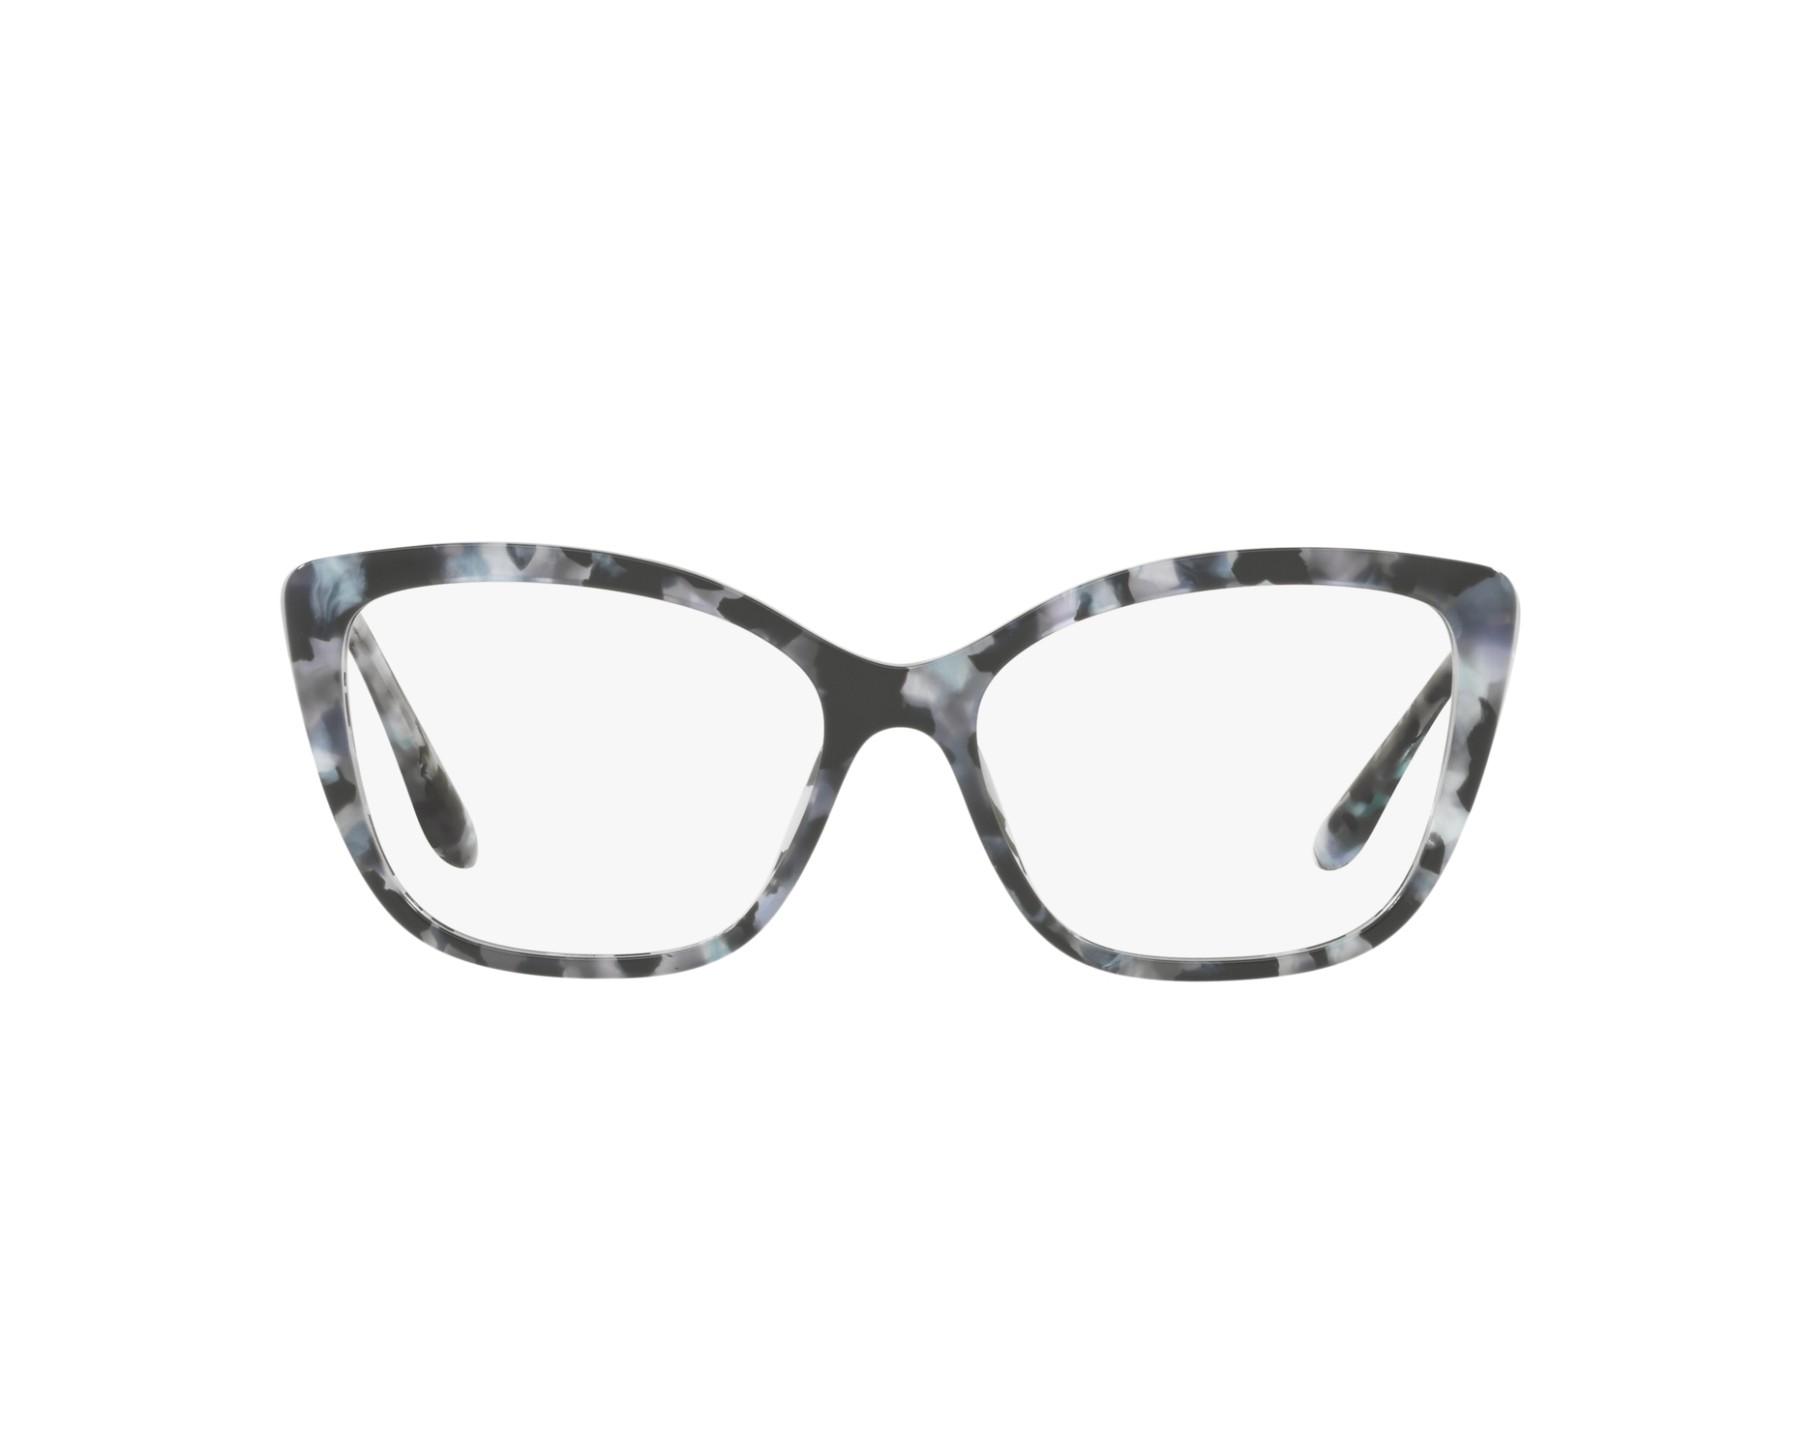 76667449c51 eyeglasses Dolce   Gabbana DG-3280 3132 - Black Silver 360 degree view 1